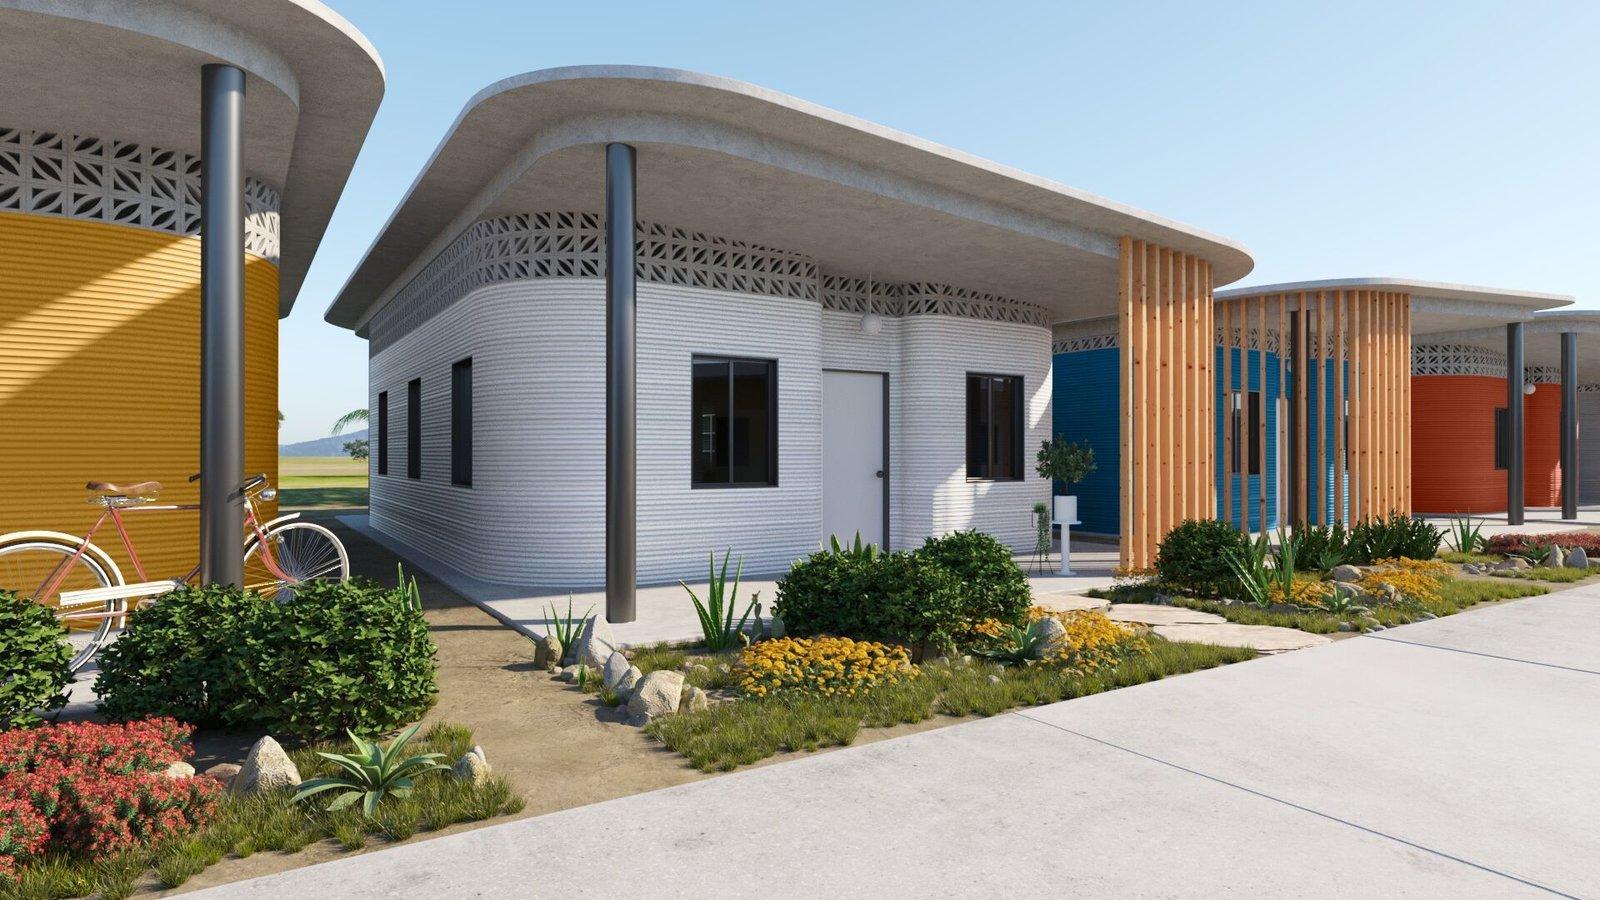 ICON 3D Printed Village rendering